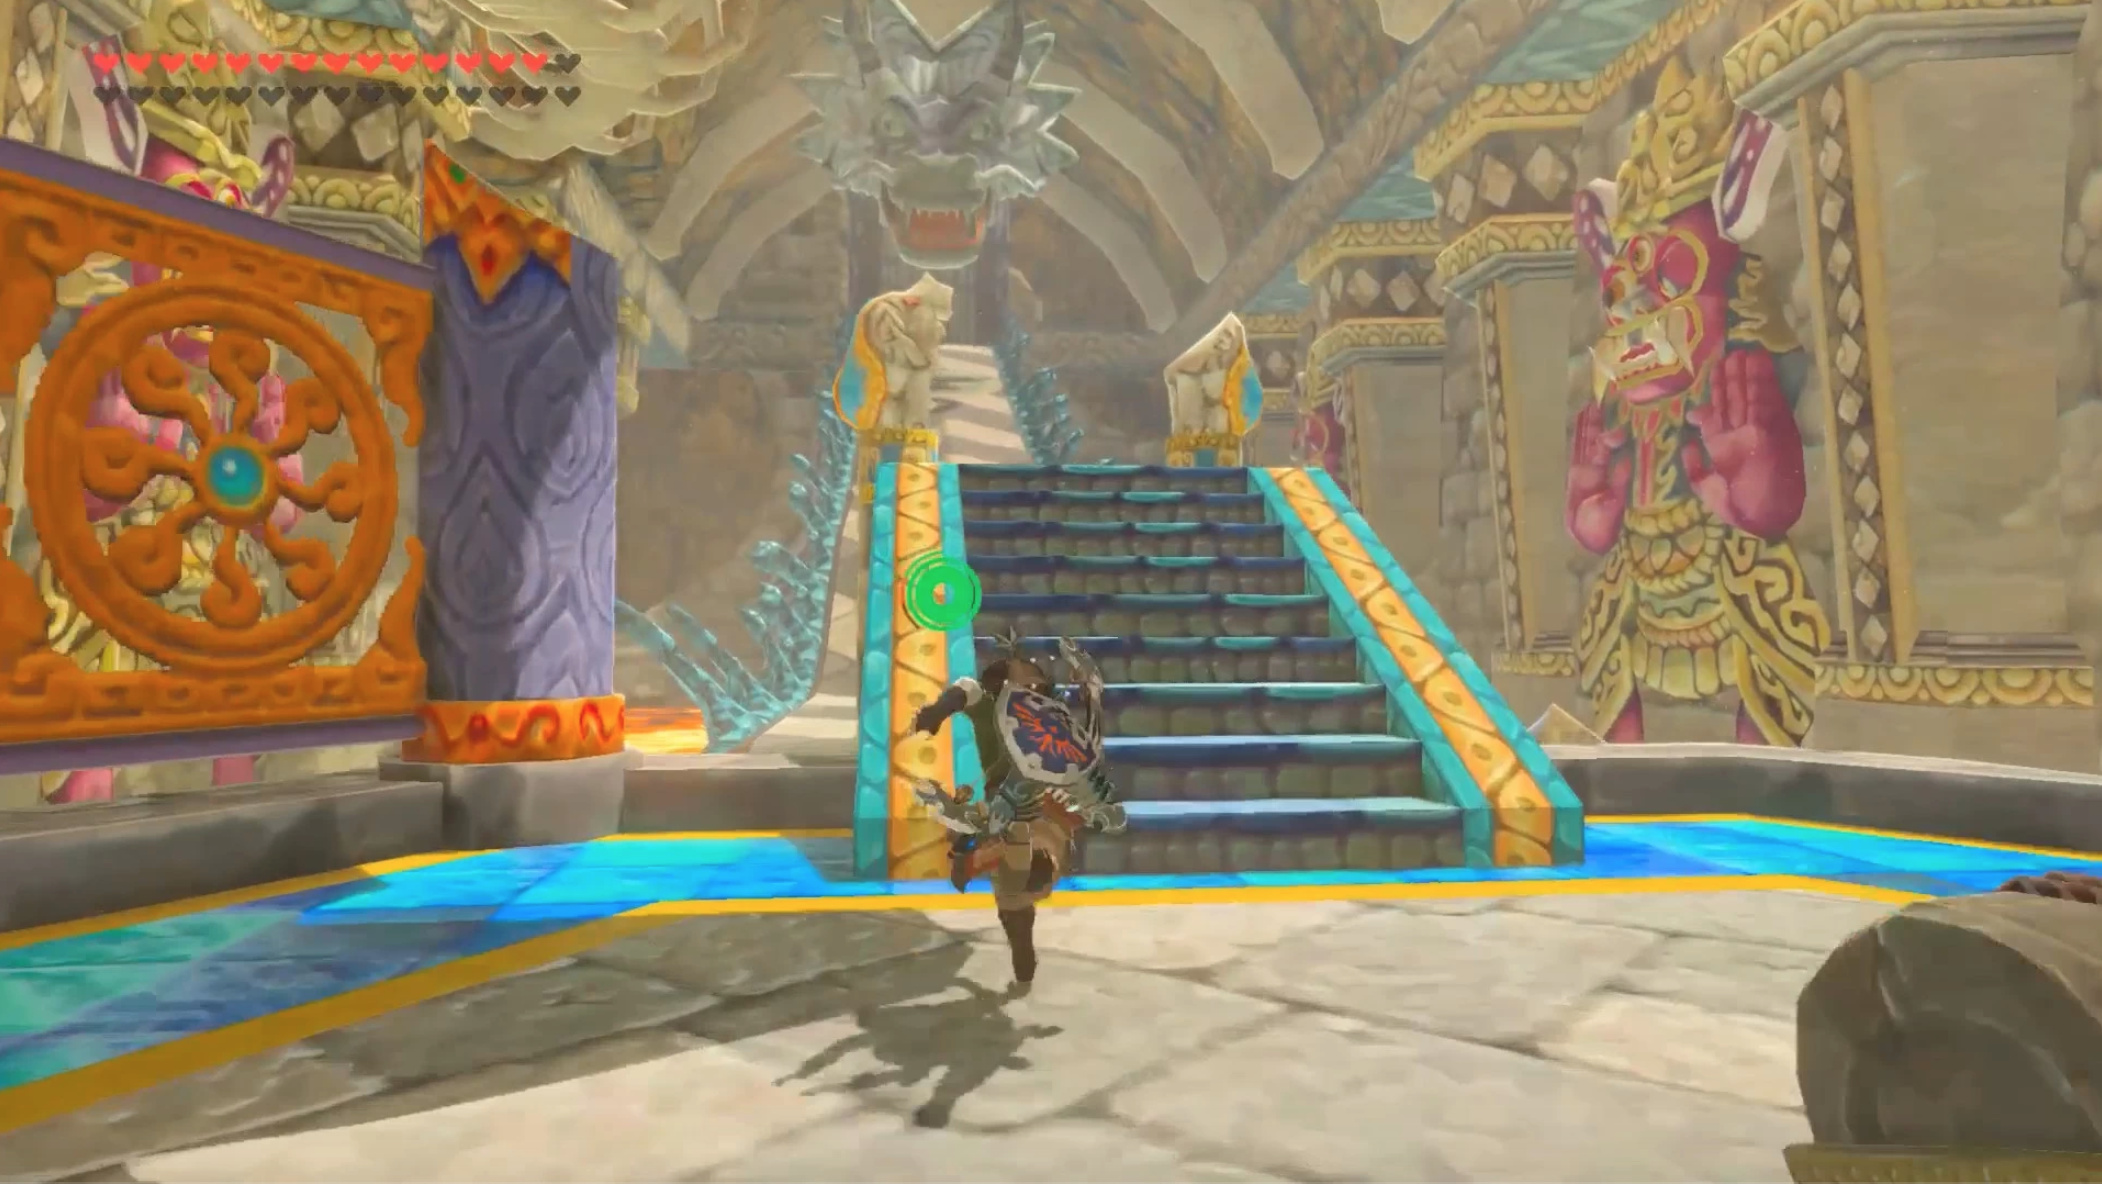 Zelda: Breath Of The Wild Mod Adds Skyward Sword's Earth